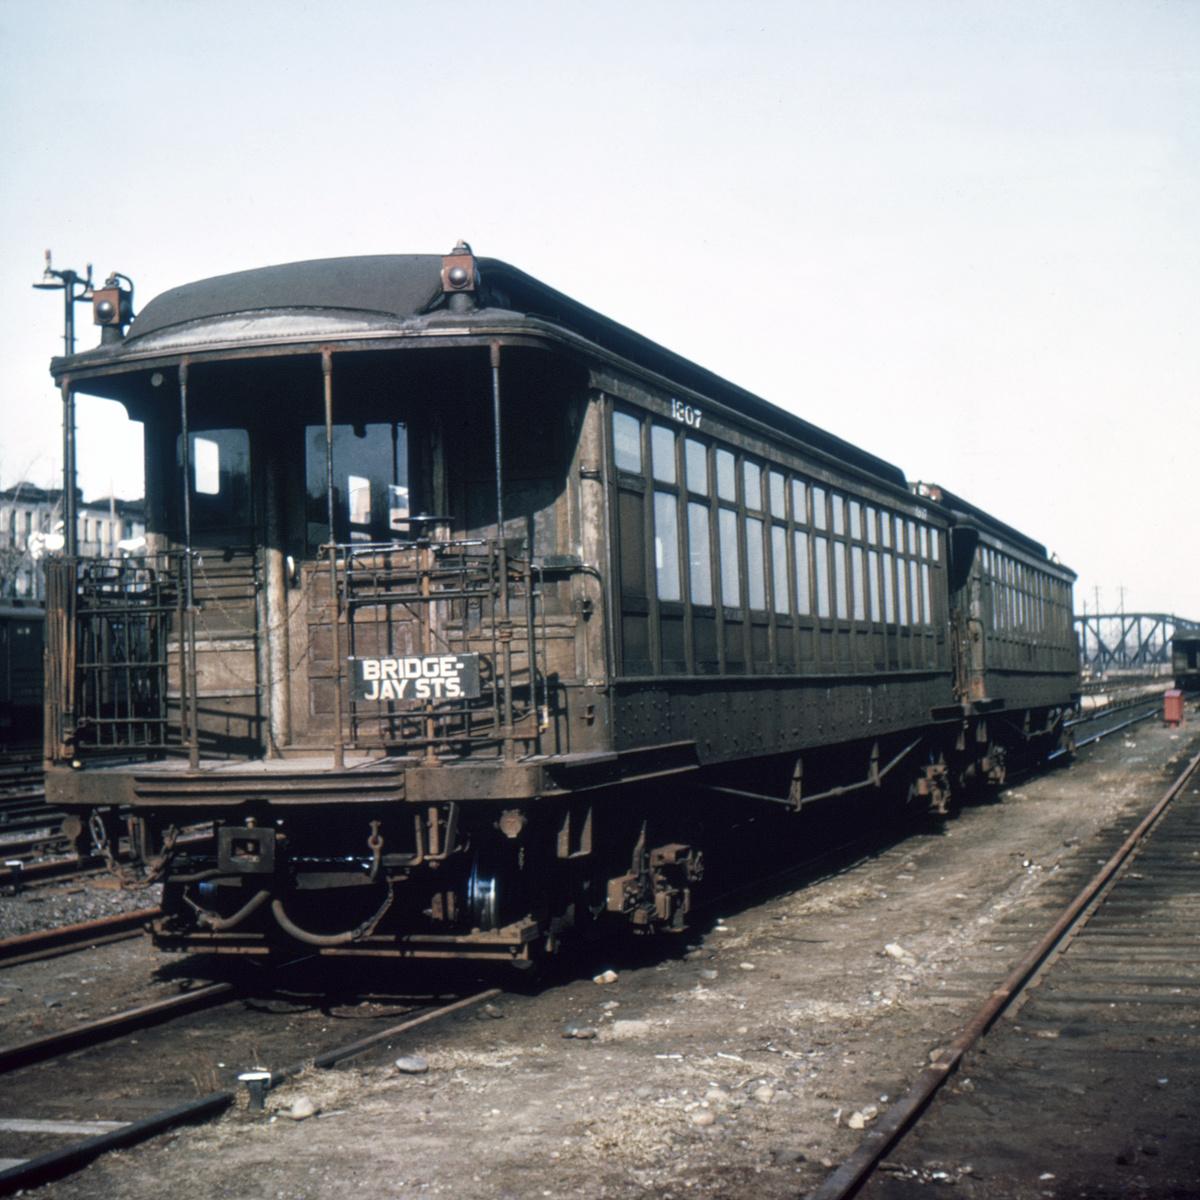 (362k, 1024x683)<br><b>Country:</b> United States<br><b>City:</b> New York<br><b>System:</b> New York City Transit<br><b>Location:</b> Fresh Pond Yard<br><b>Car:</b> BMT Elevated Gate Car 1207 <br><b>Collection of:</b> David Pirmann<br><b>Notes:</b> probably between 1944 and 1958<br><b>Viewed (this week/total):</b> 0 / 5272